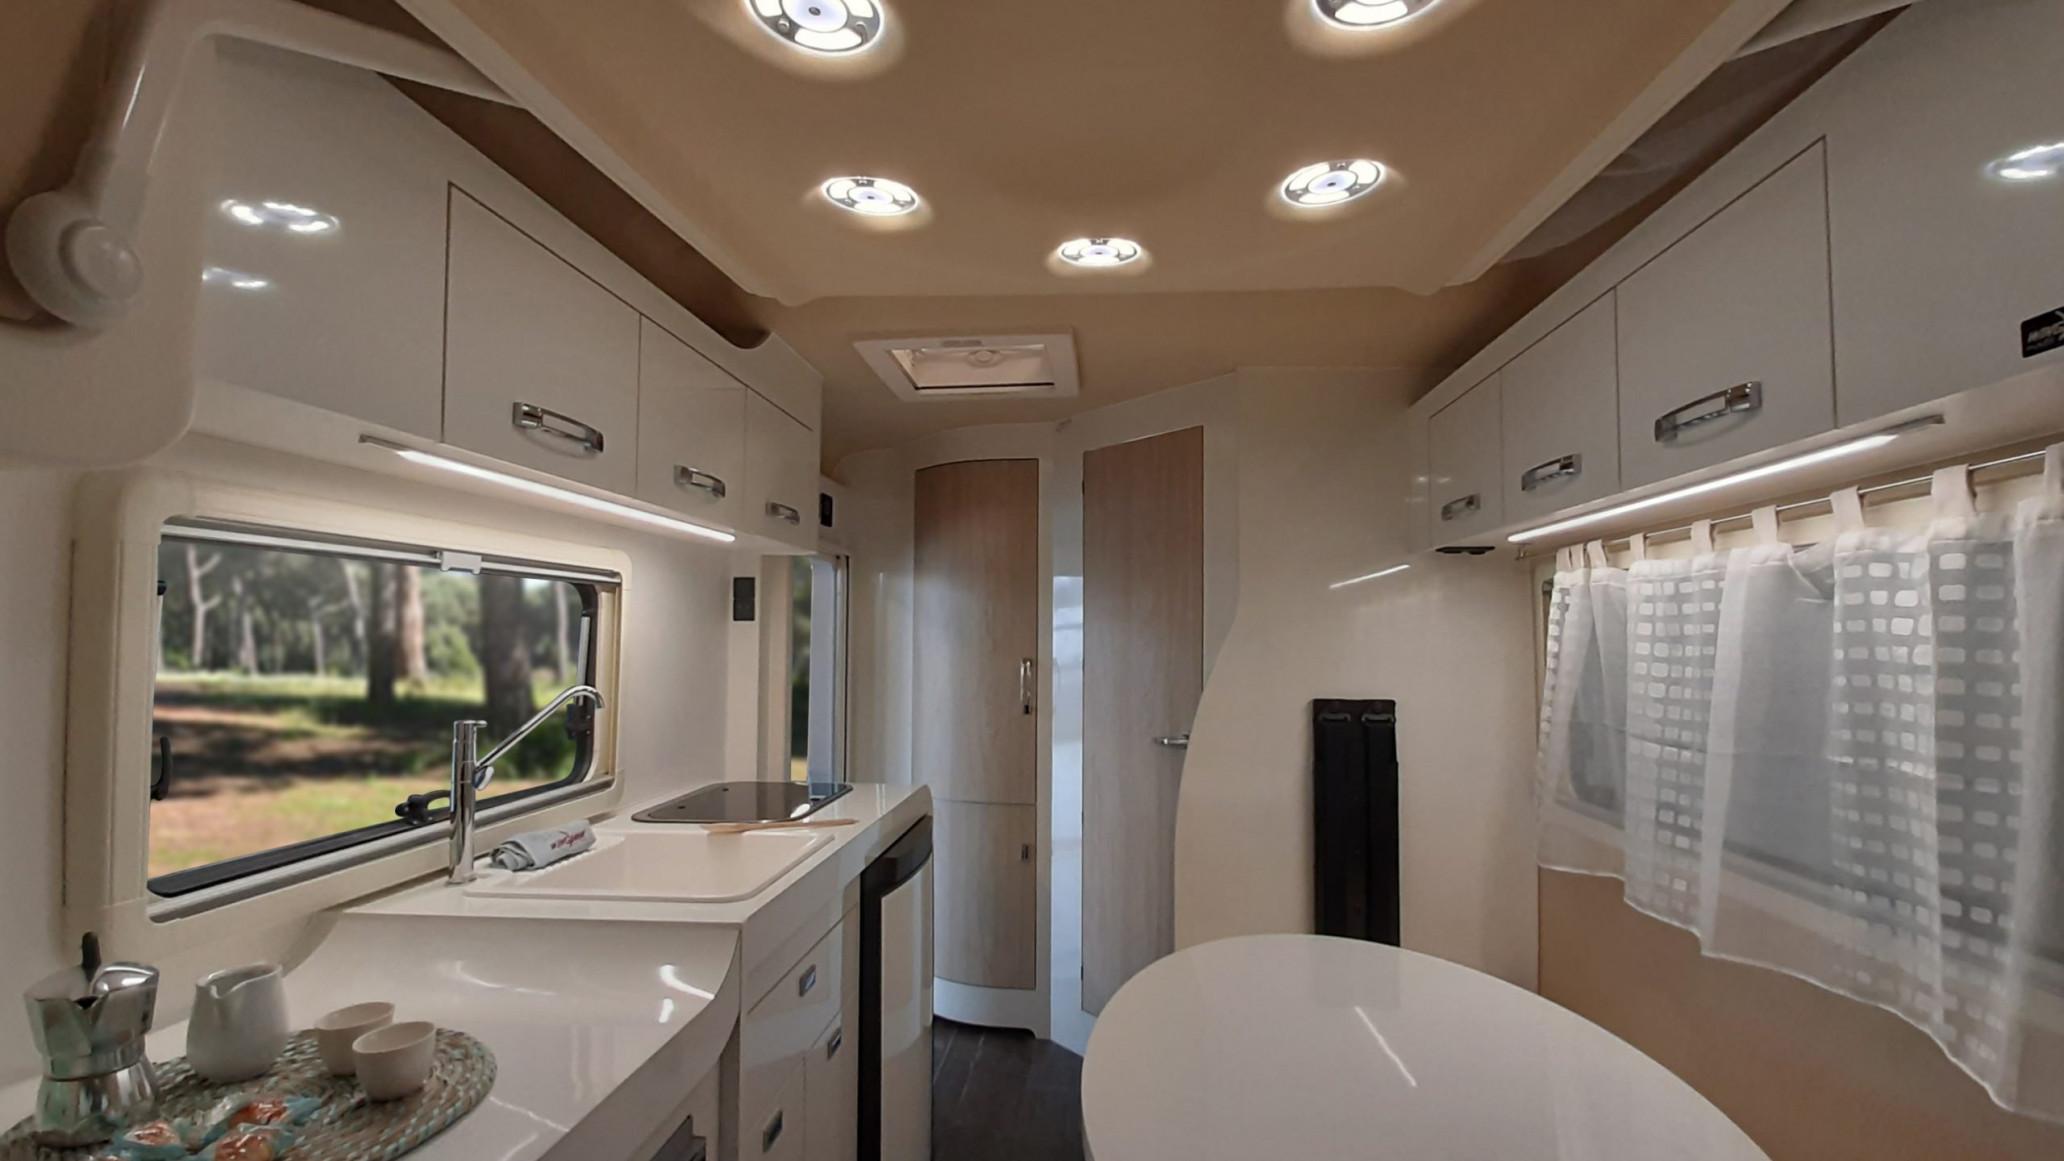 20201127_150924 - camping-car